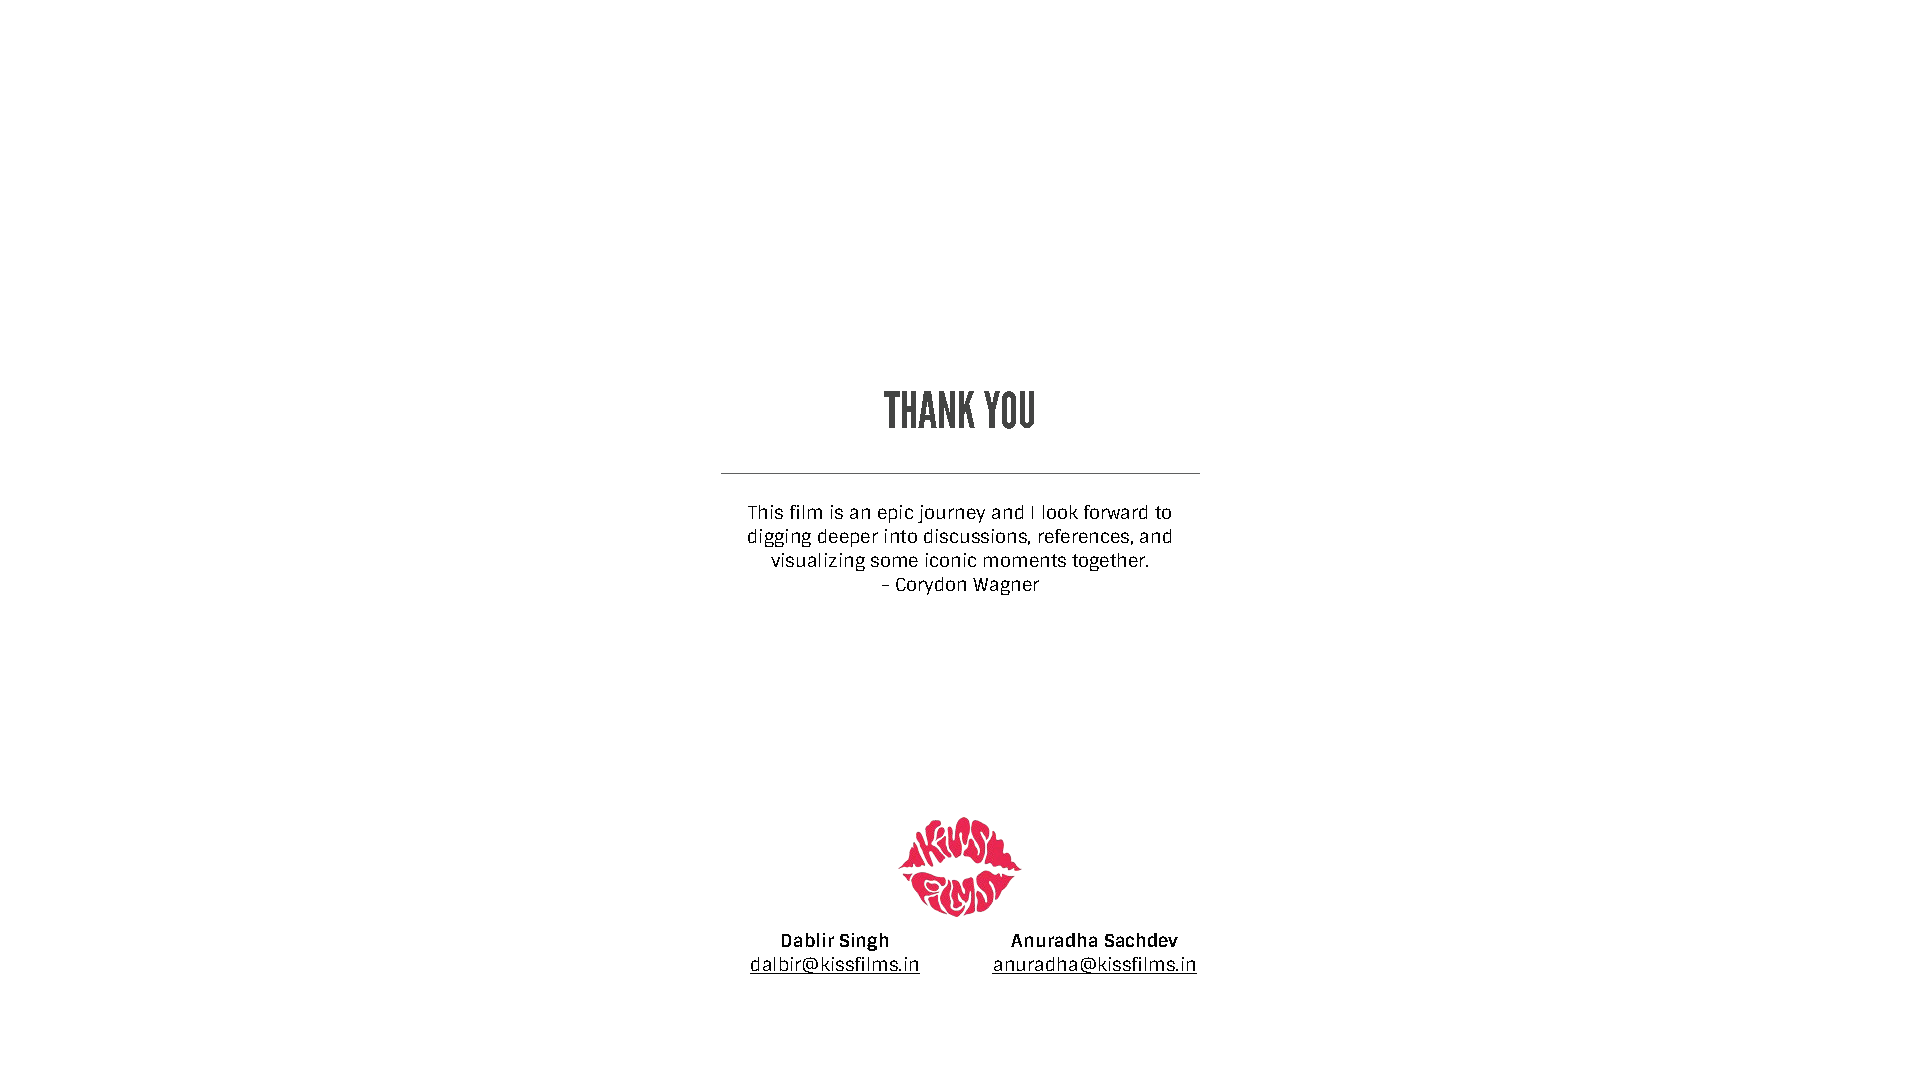 Samsung-Chiel-Kissfilms-Treatment-v8_Page_31.png